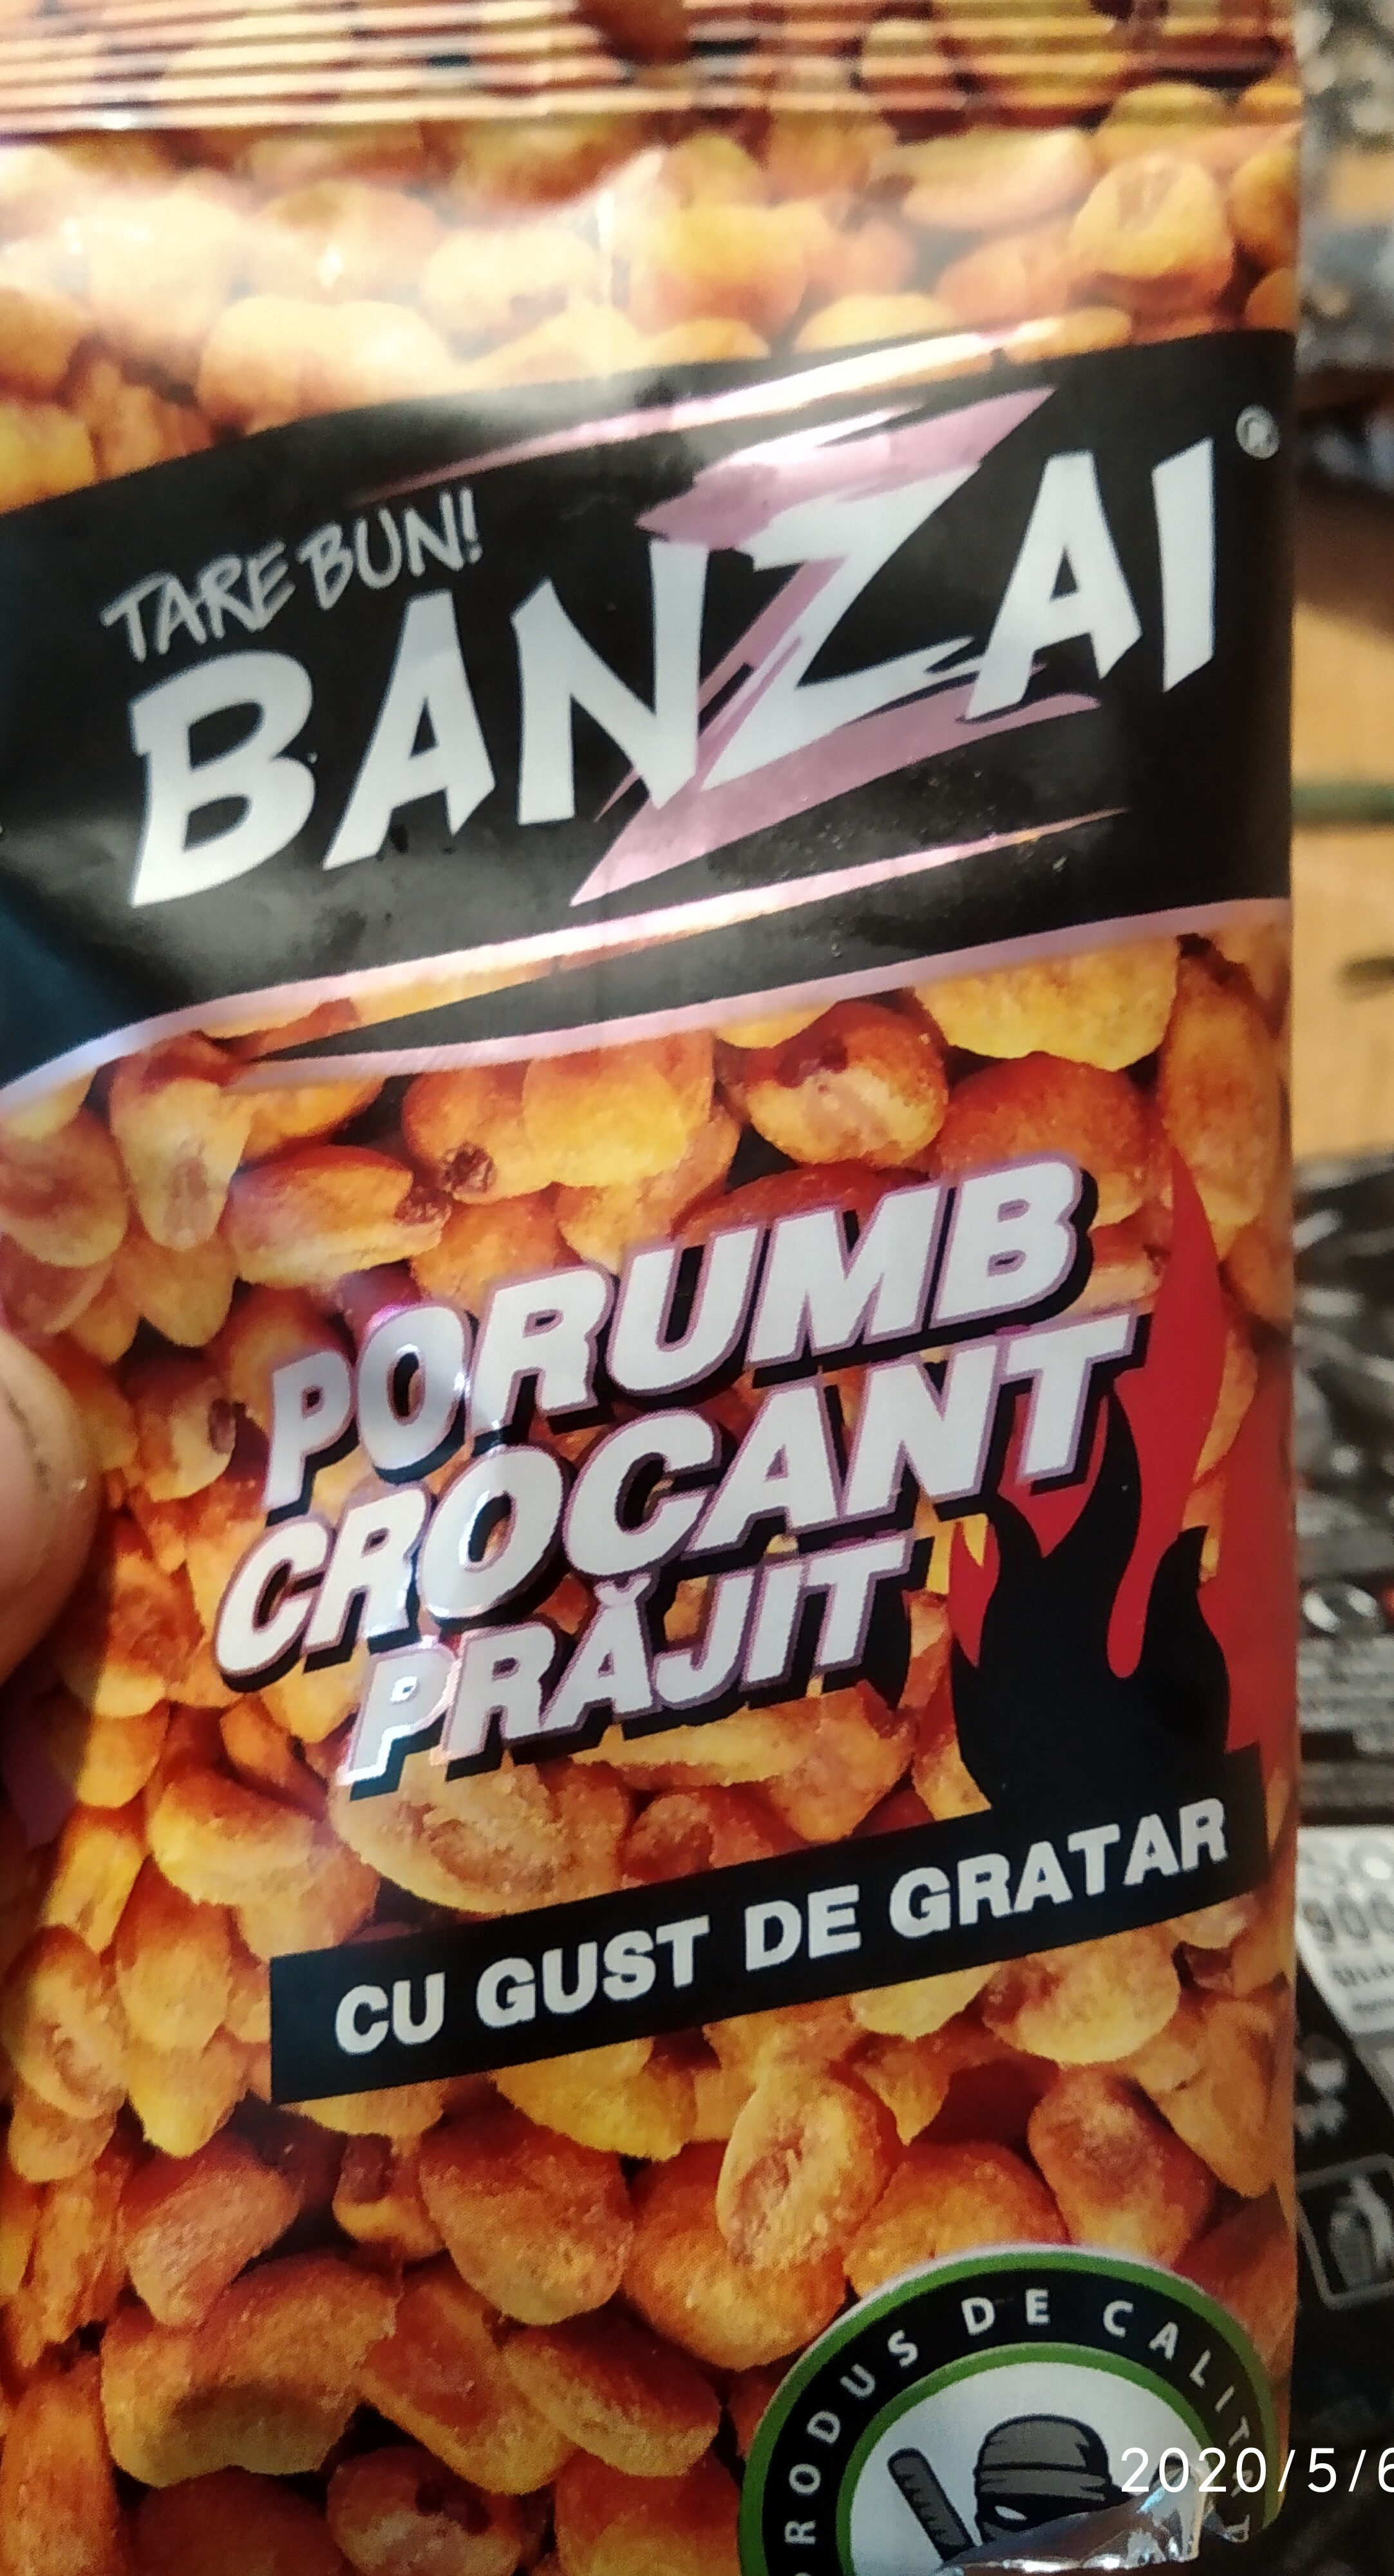 Porumb crocant prăjit - Product - ro